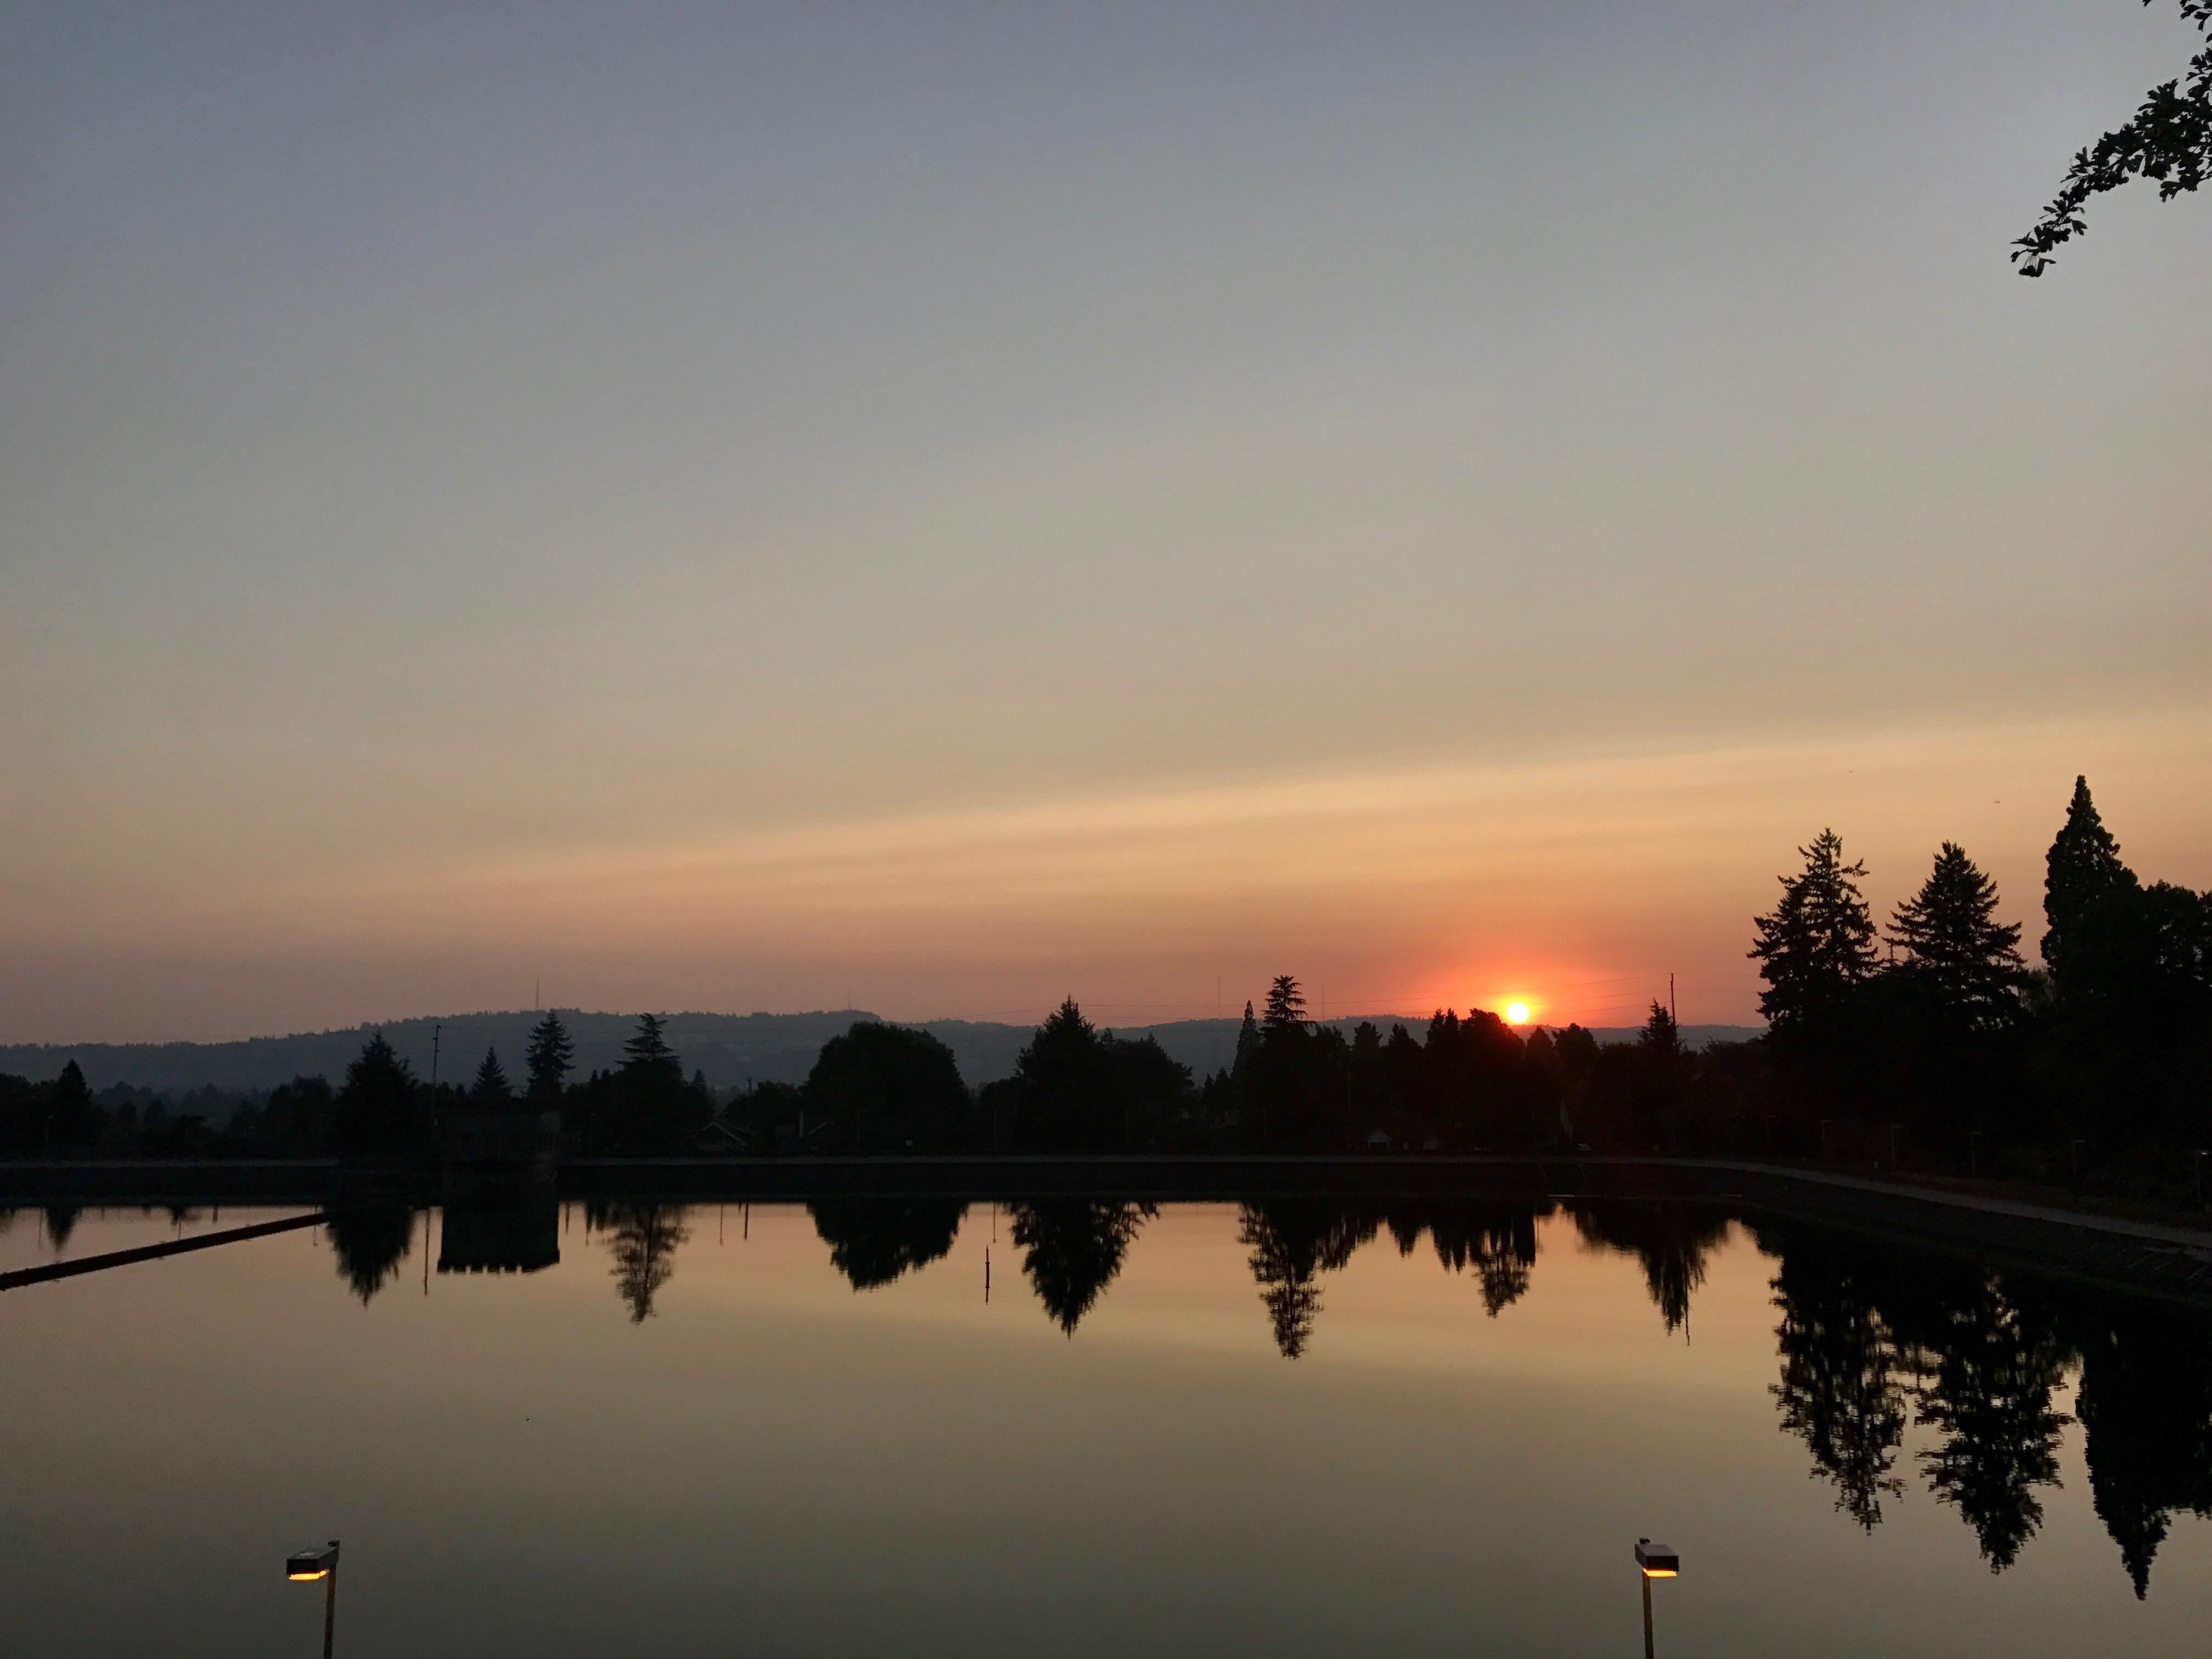 Twilight at Mt. Tabor